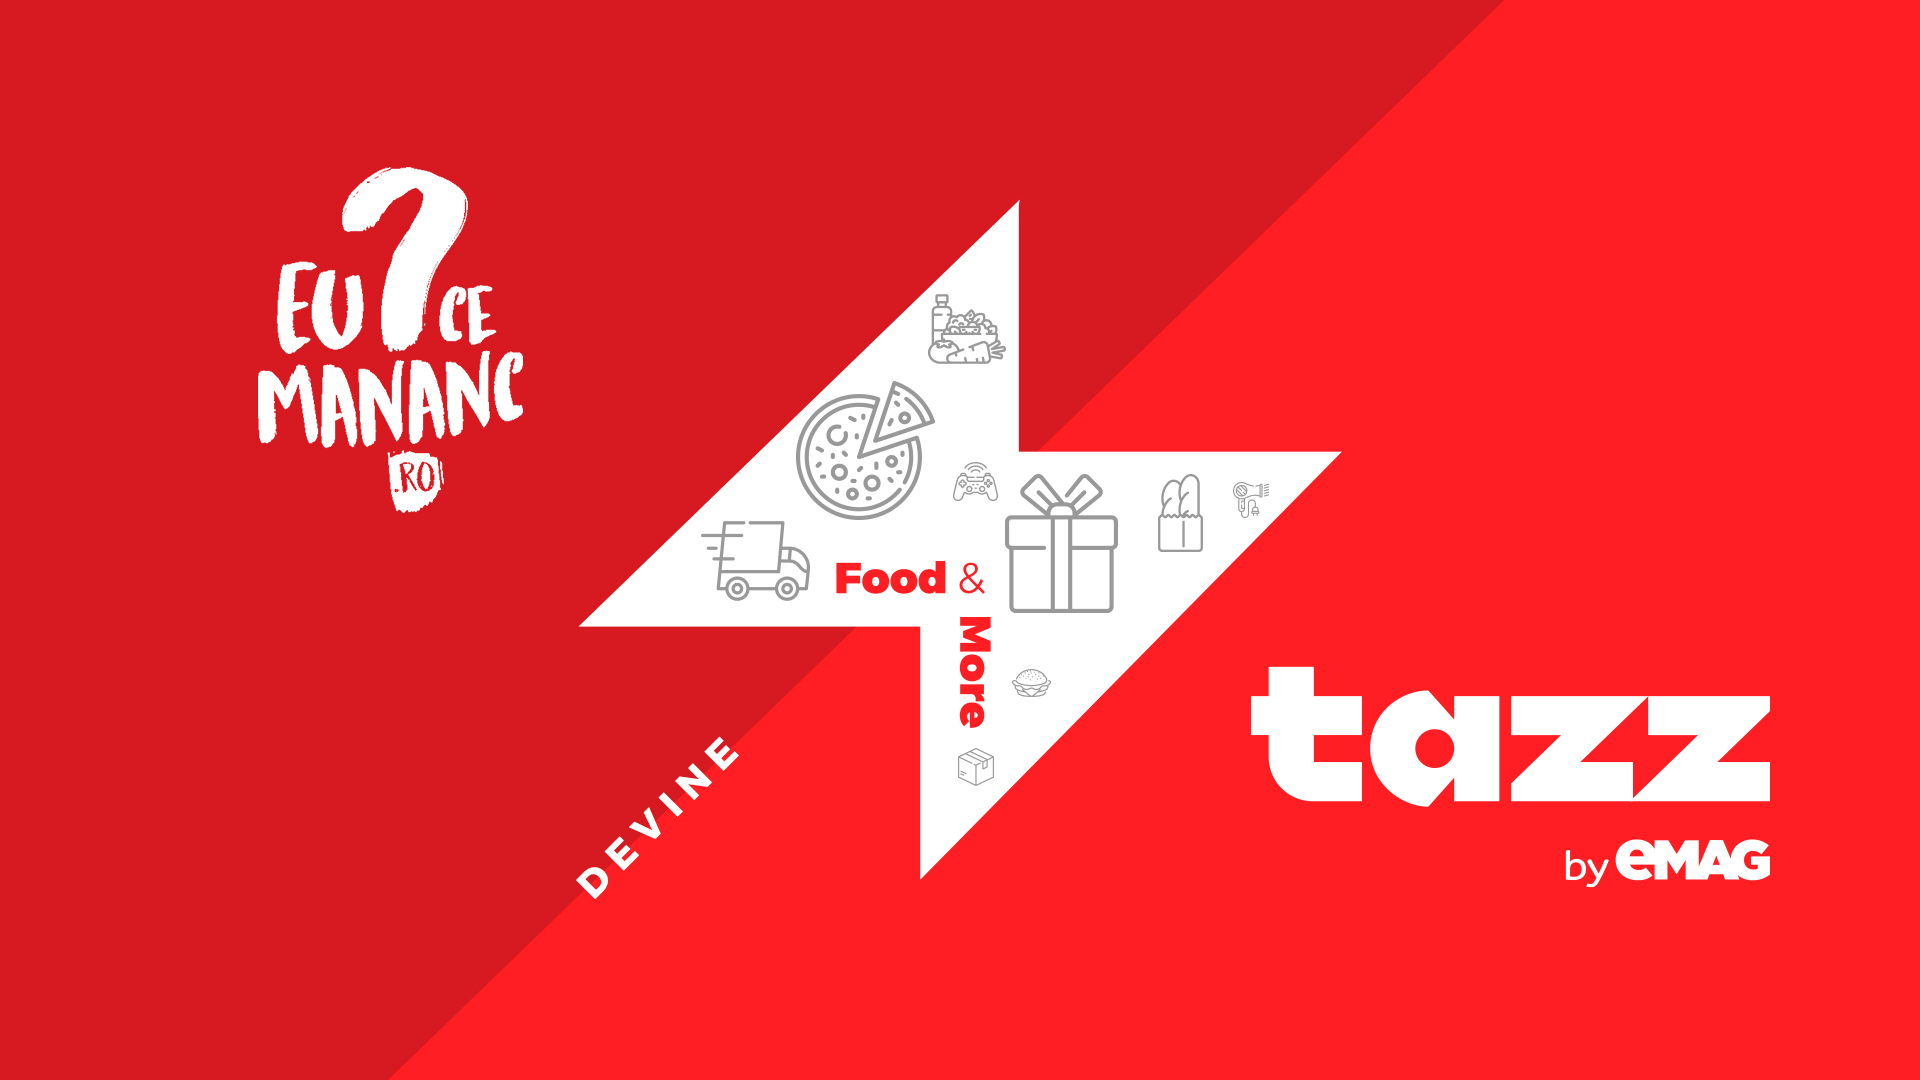 Platforma EuCeMănânc devine Tazz by eMAG – viteză și diversitate la tine acasă